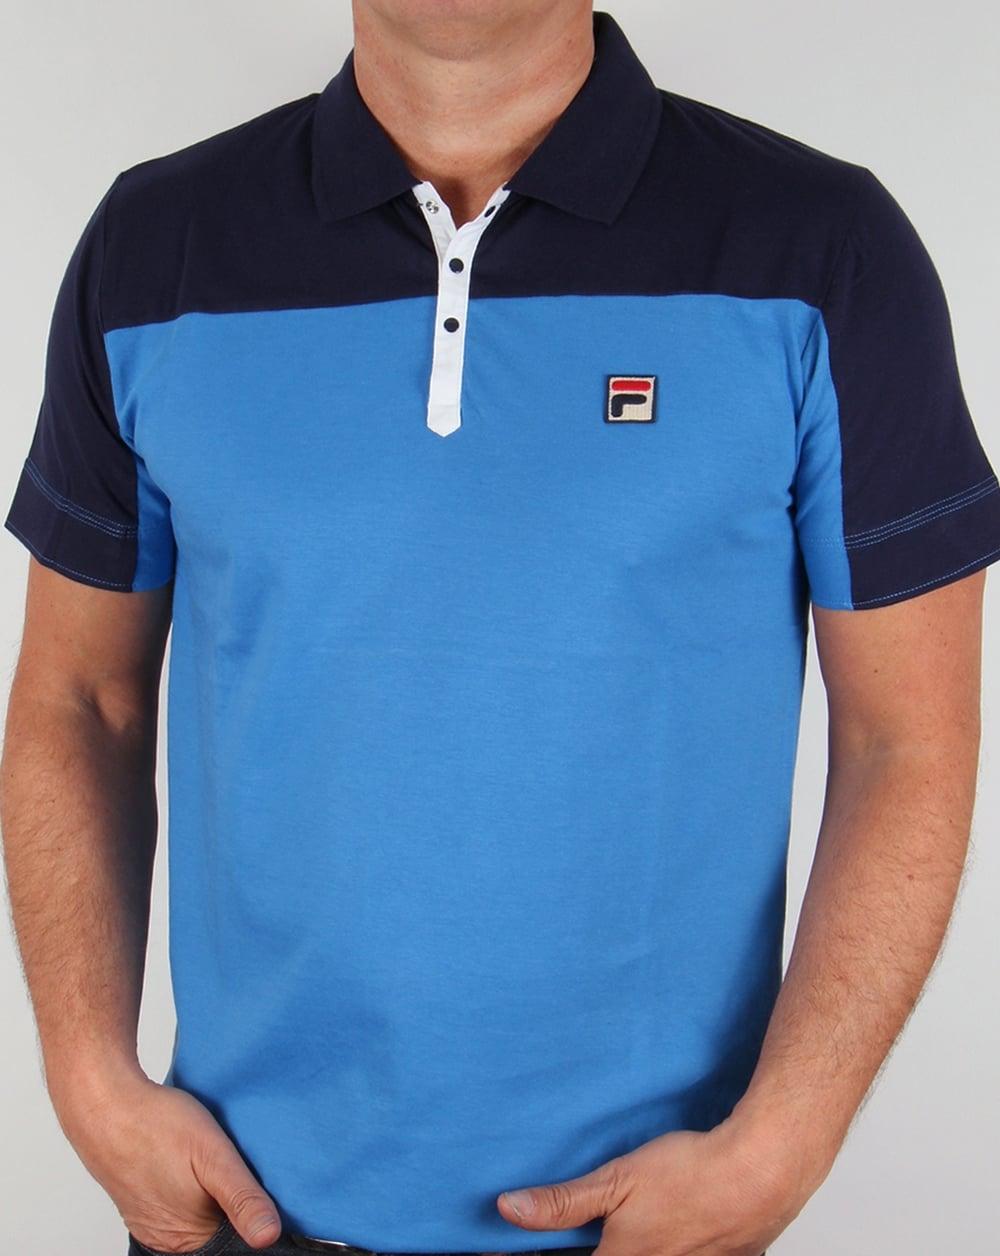 Fila Vintage Corsair Polo Shirt Ocean Blue,mens,classic,retro